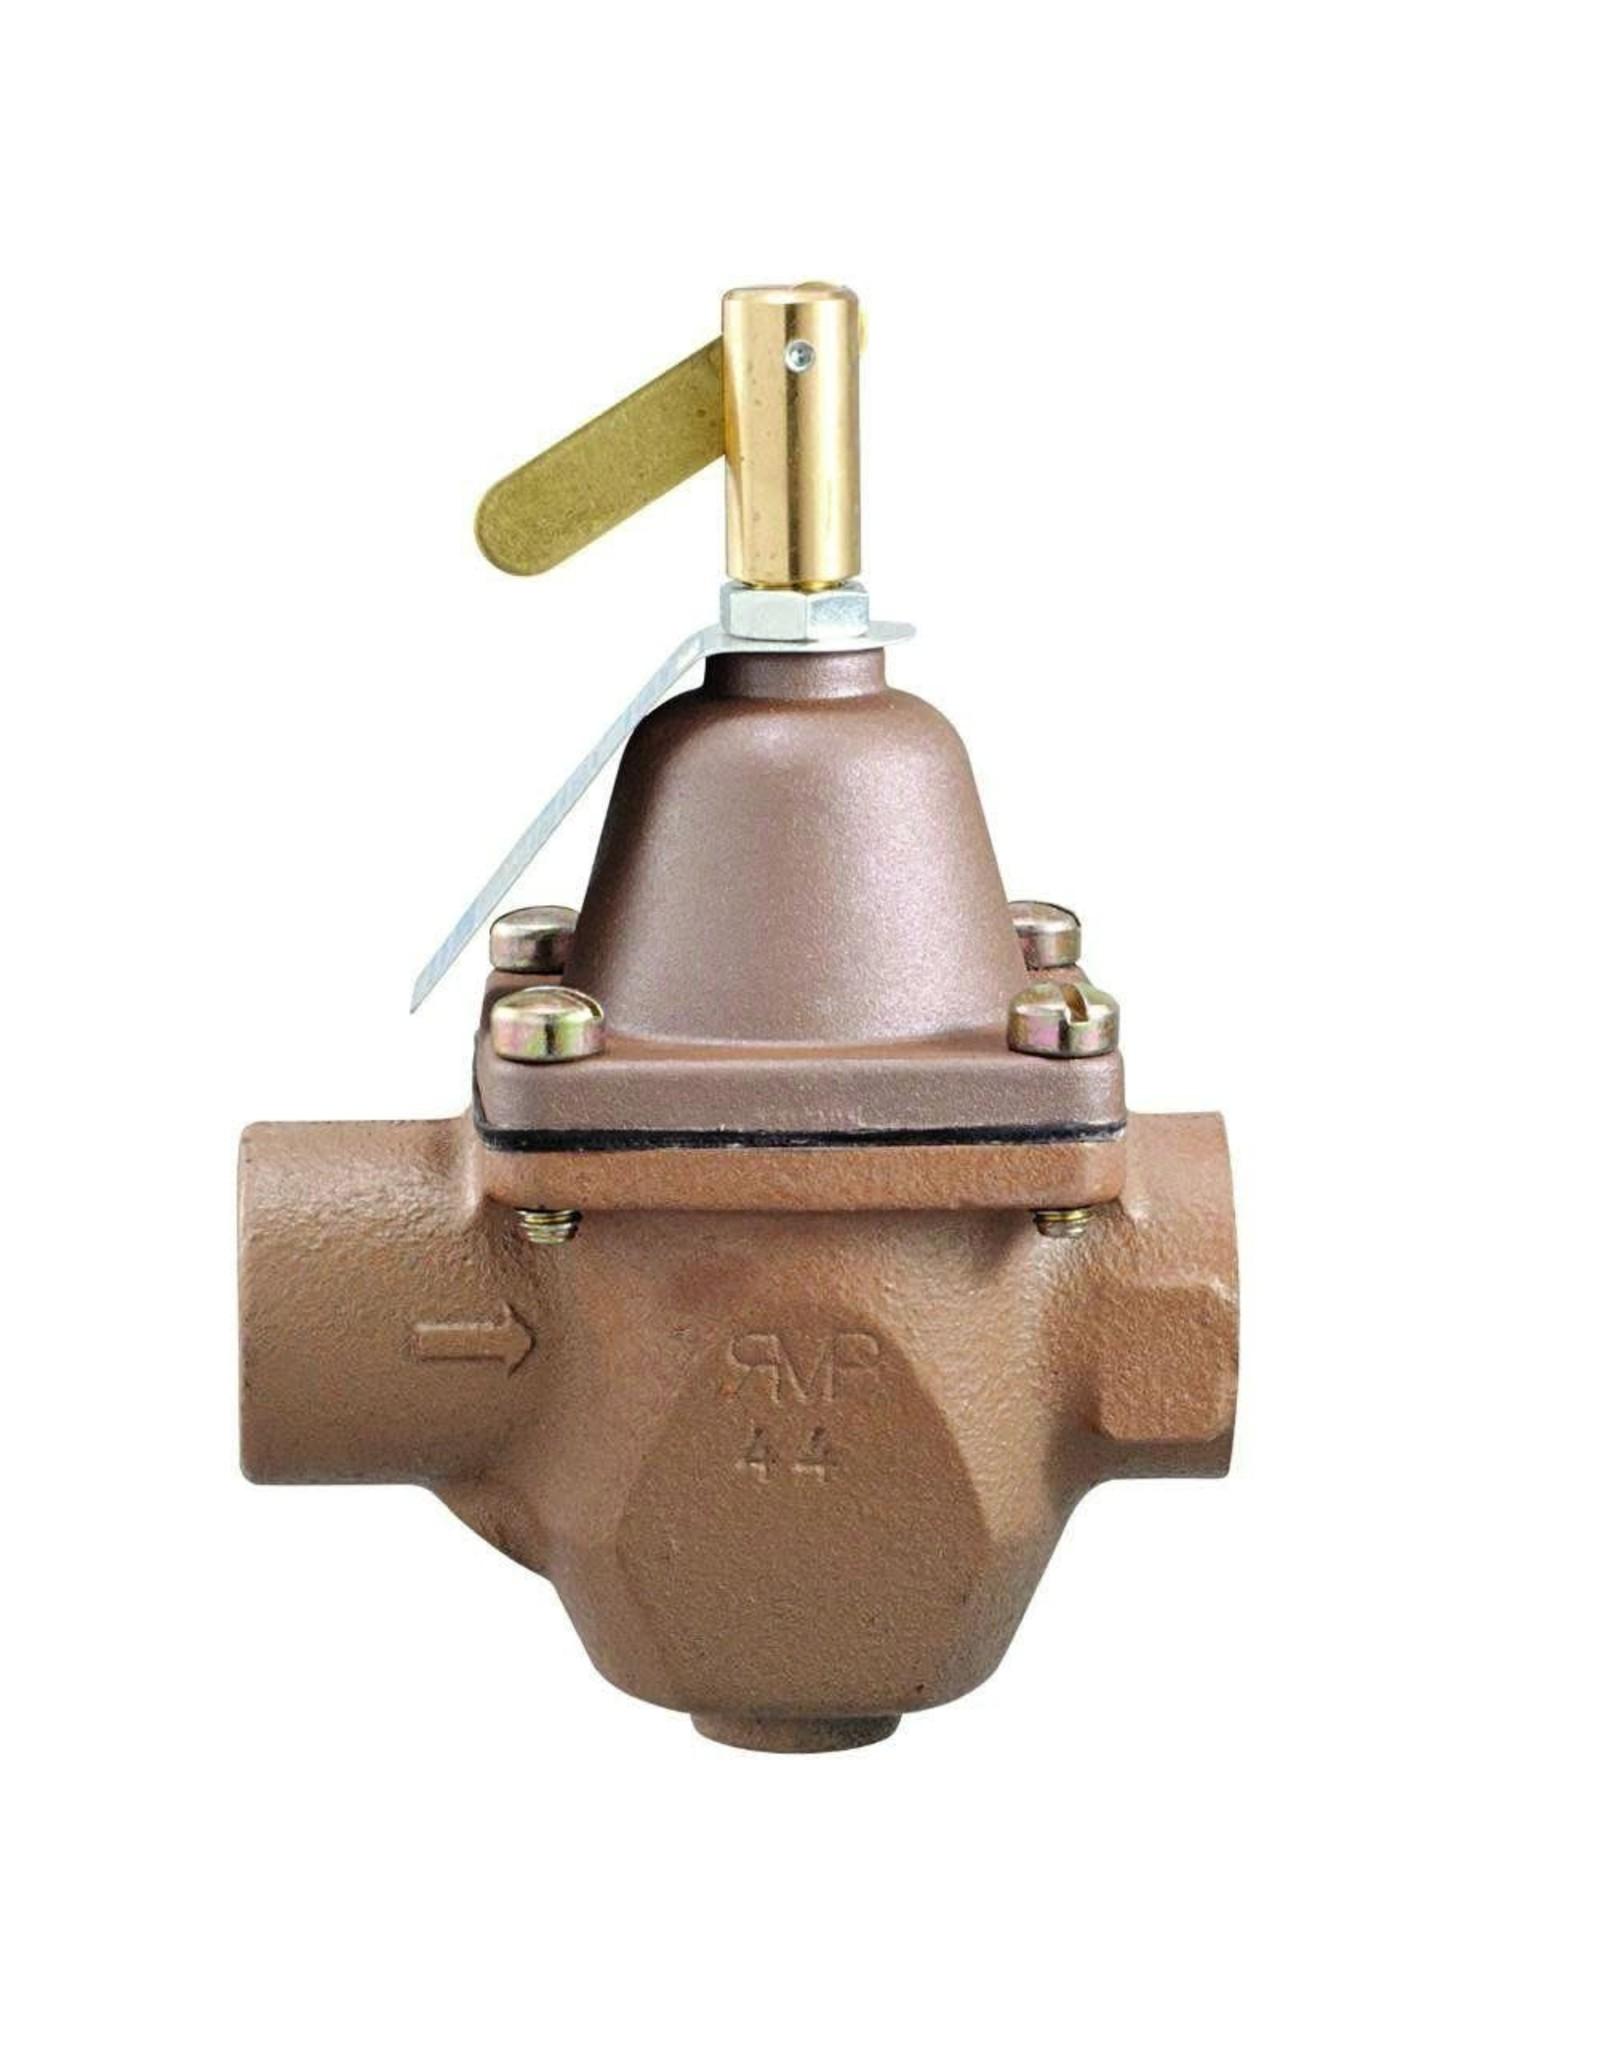 Watts Brass & Tubular 1156F 1/2 1/2 Boil Feed Regulator